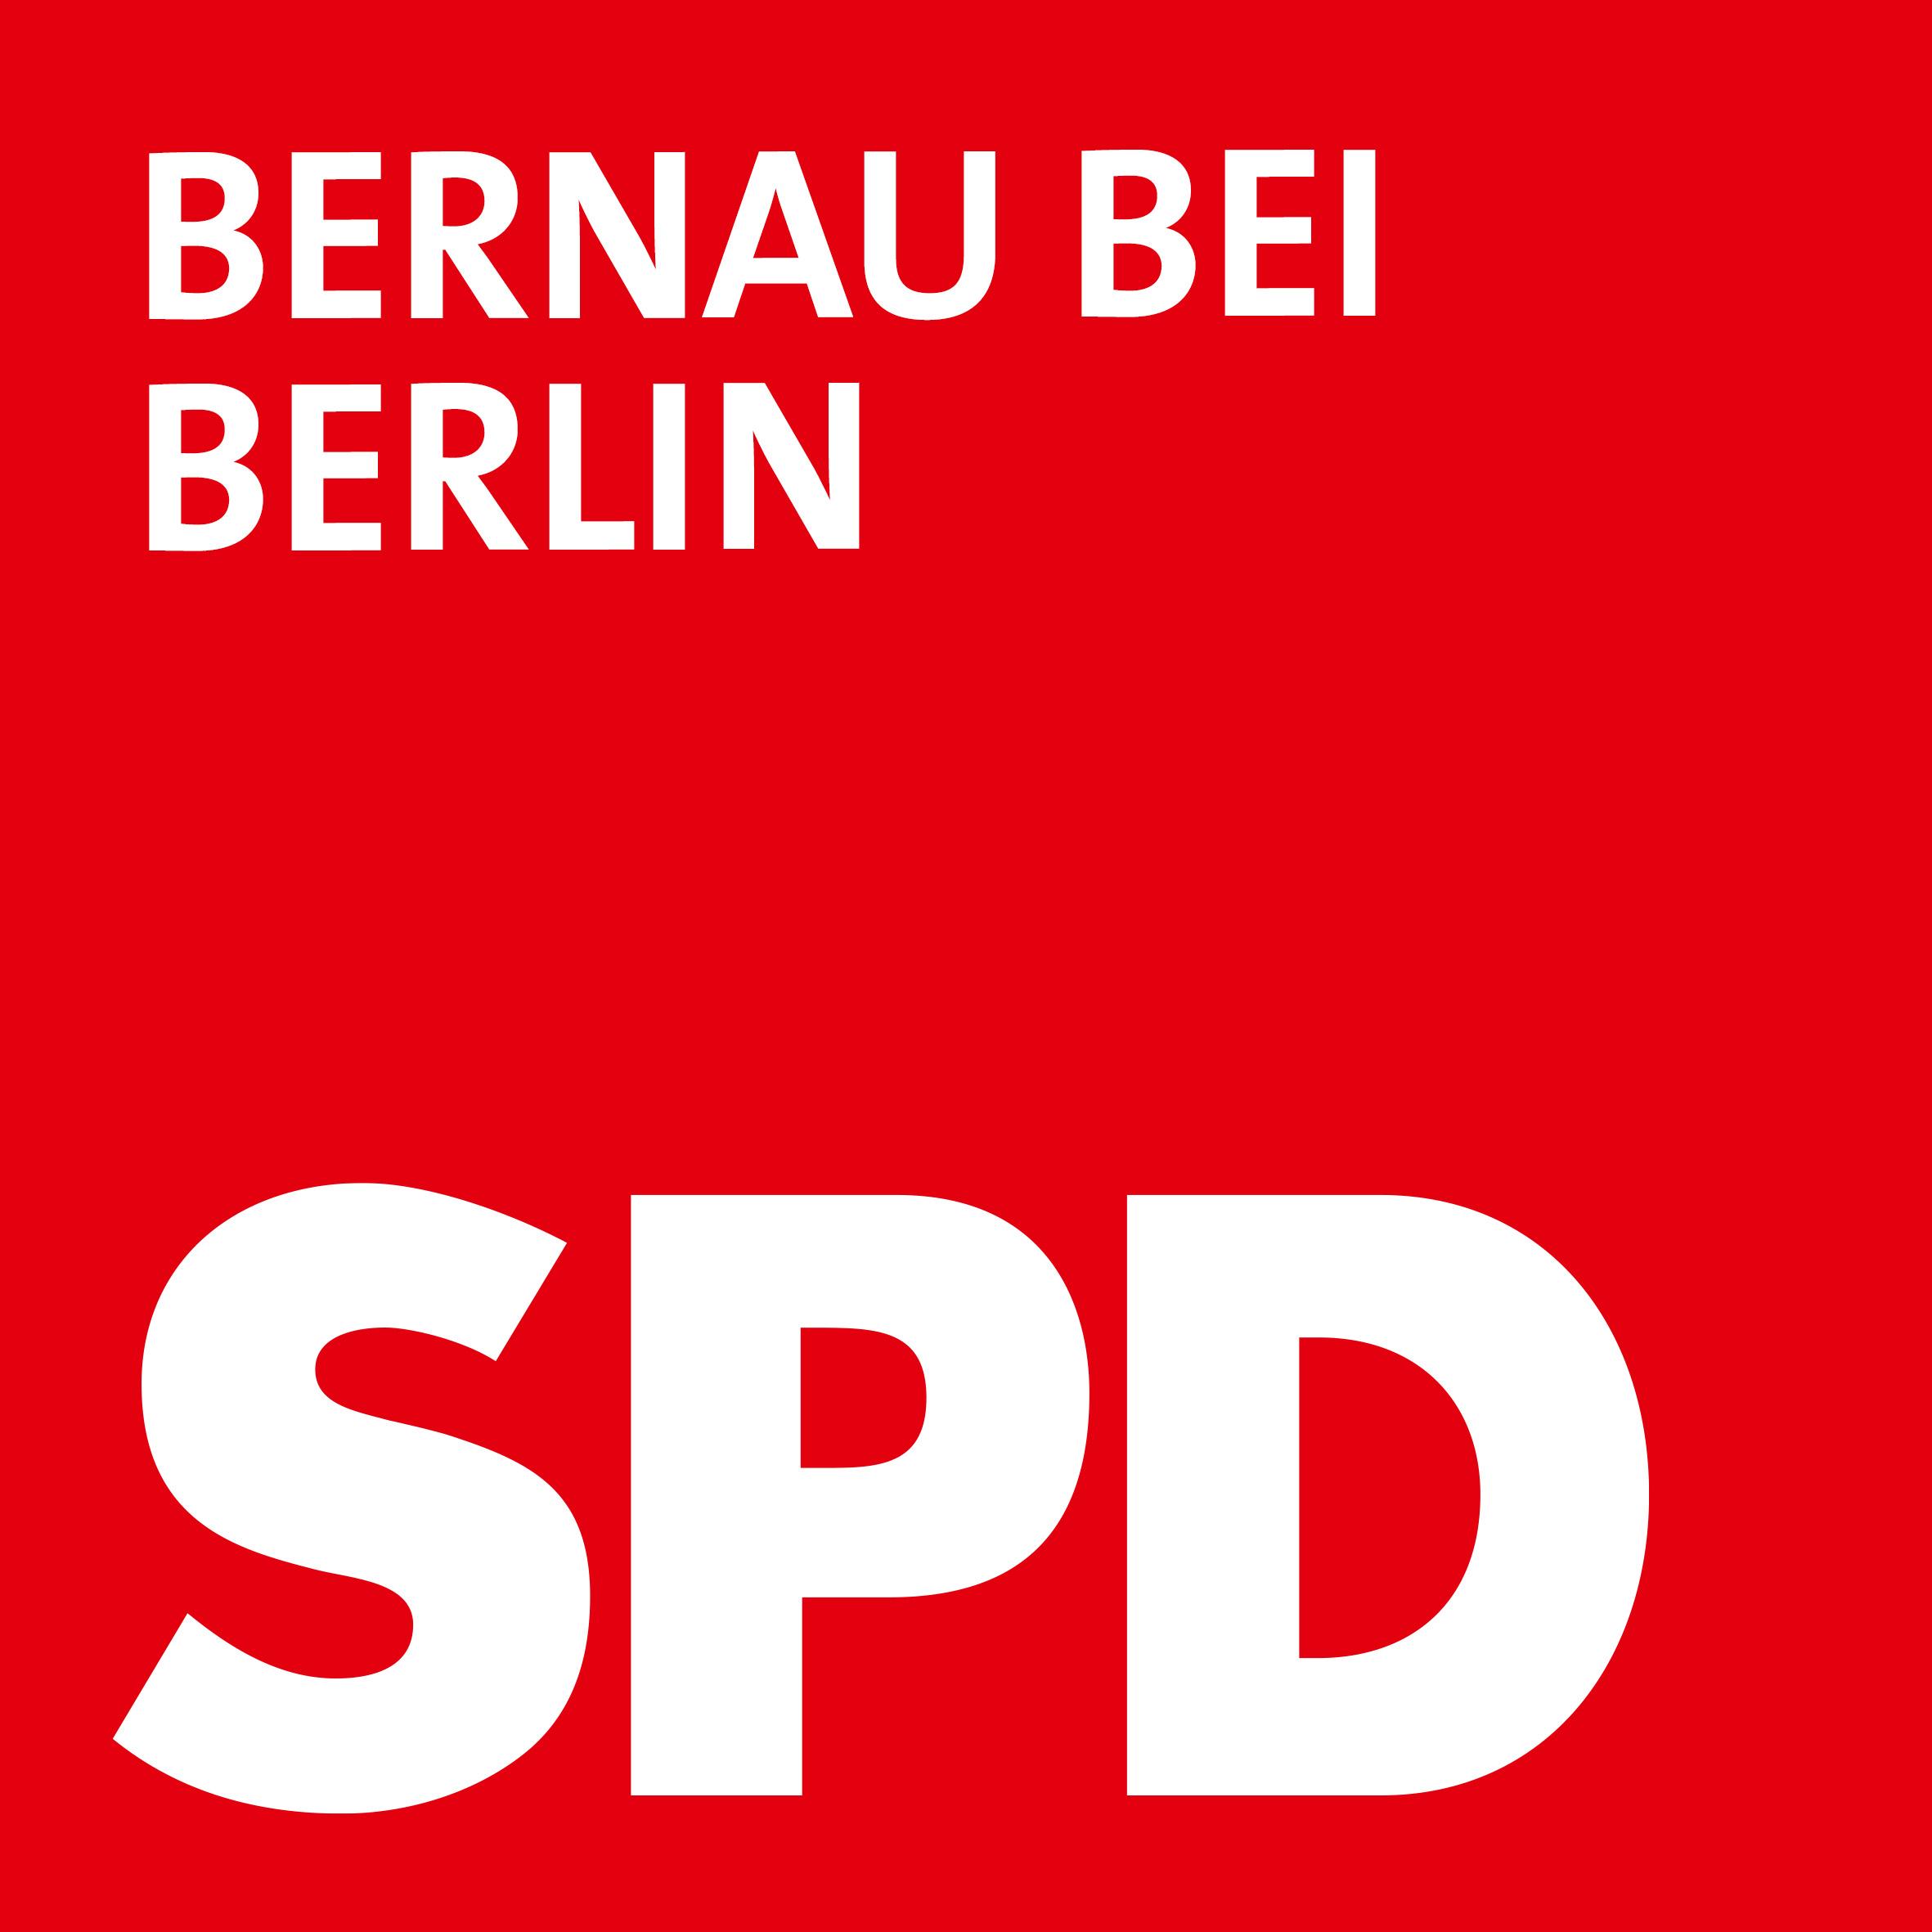 SPD Bernau bei Berlin